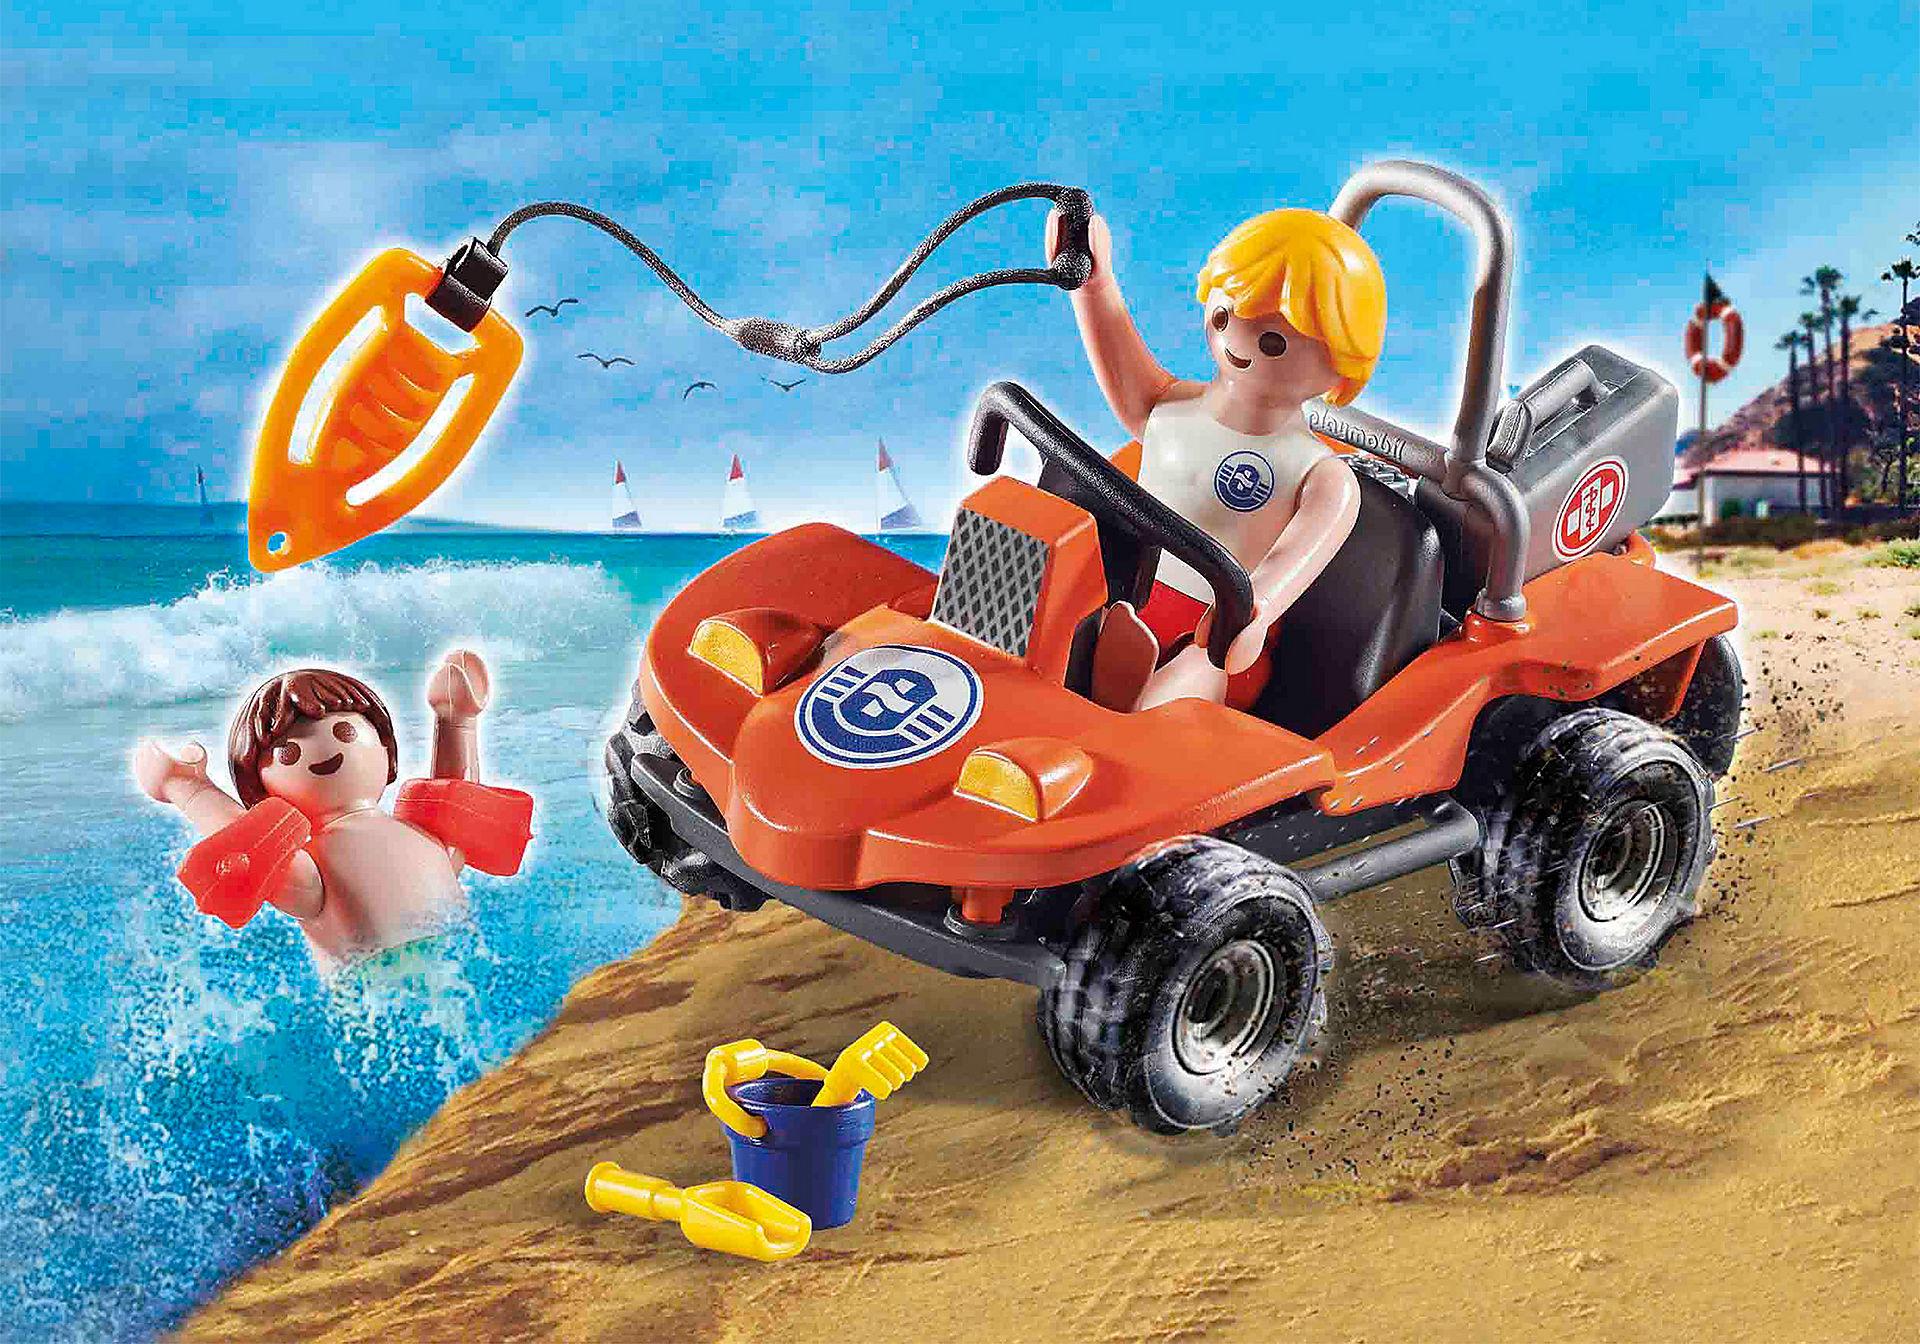 70661 Lifeguard Beach Patrol zoom image1